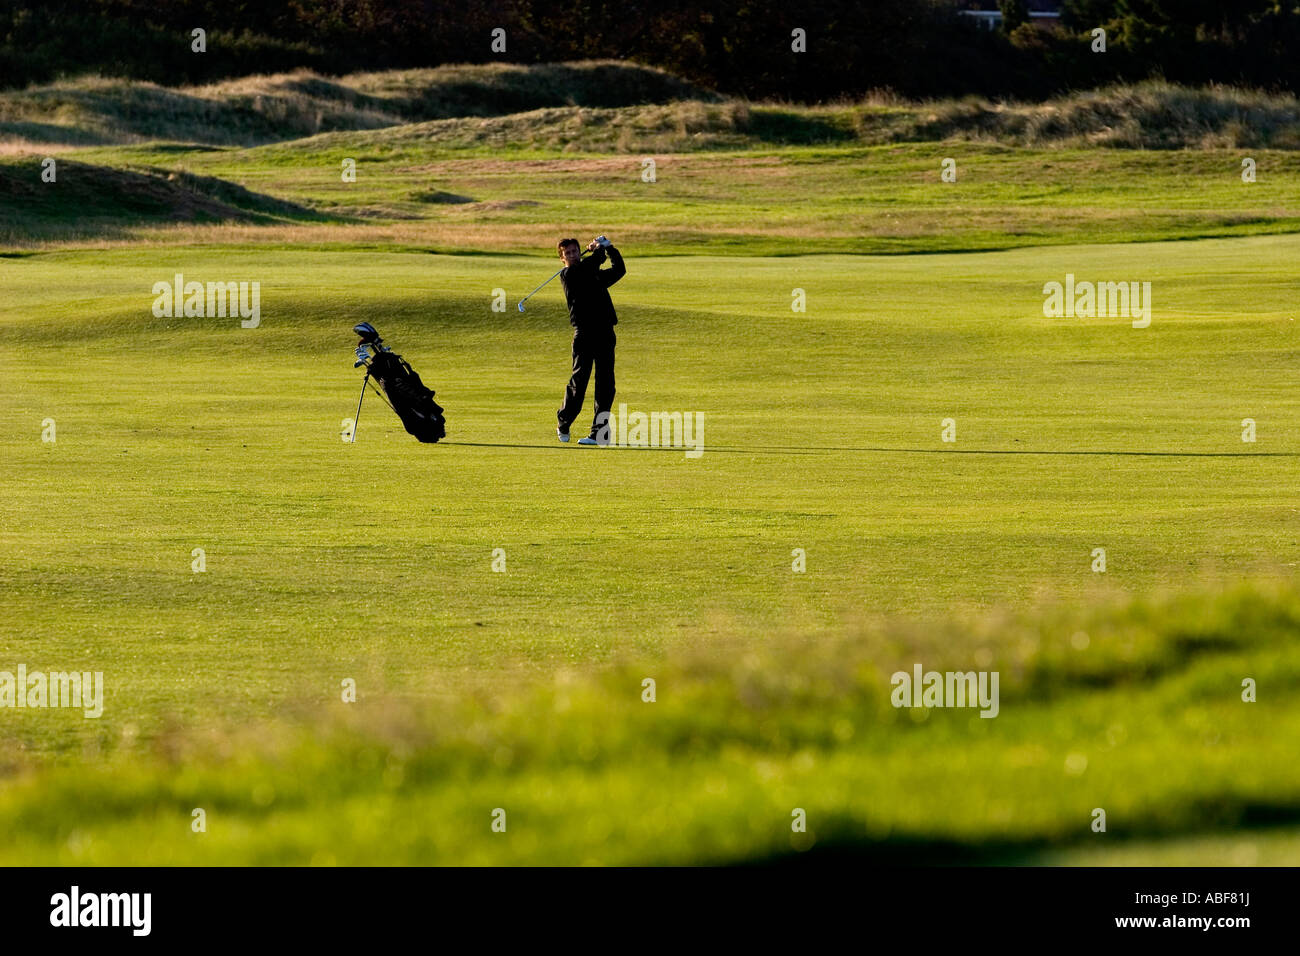 Golfer, approach shot. - Stock Image